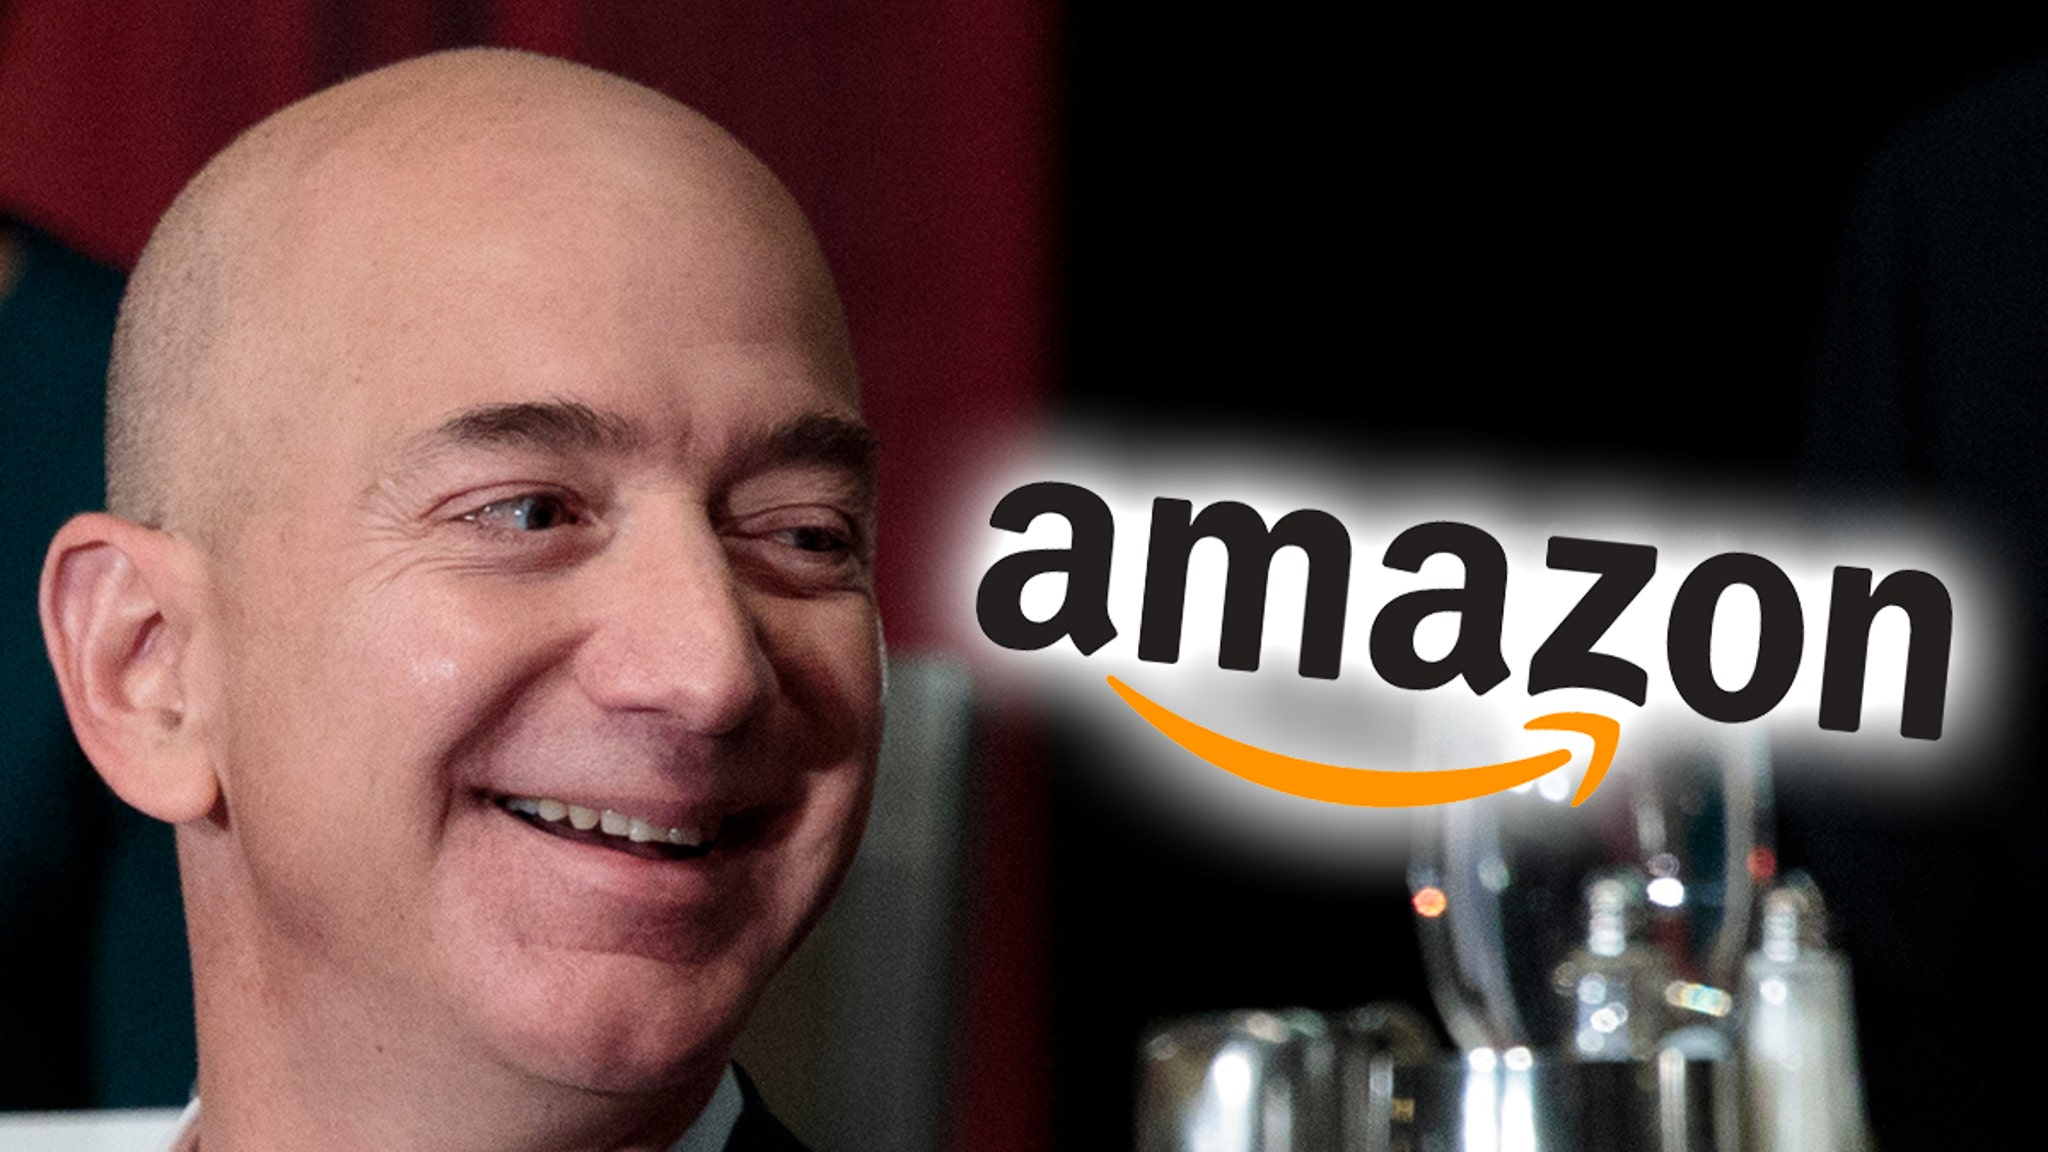 Jeff Bezos Is the World's First $200 Billion Man